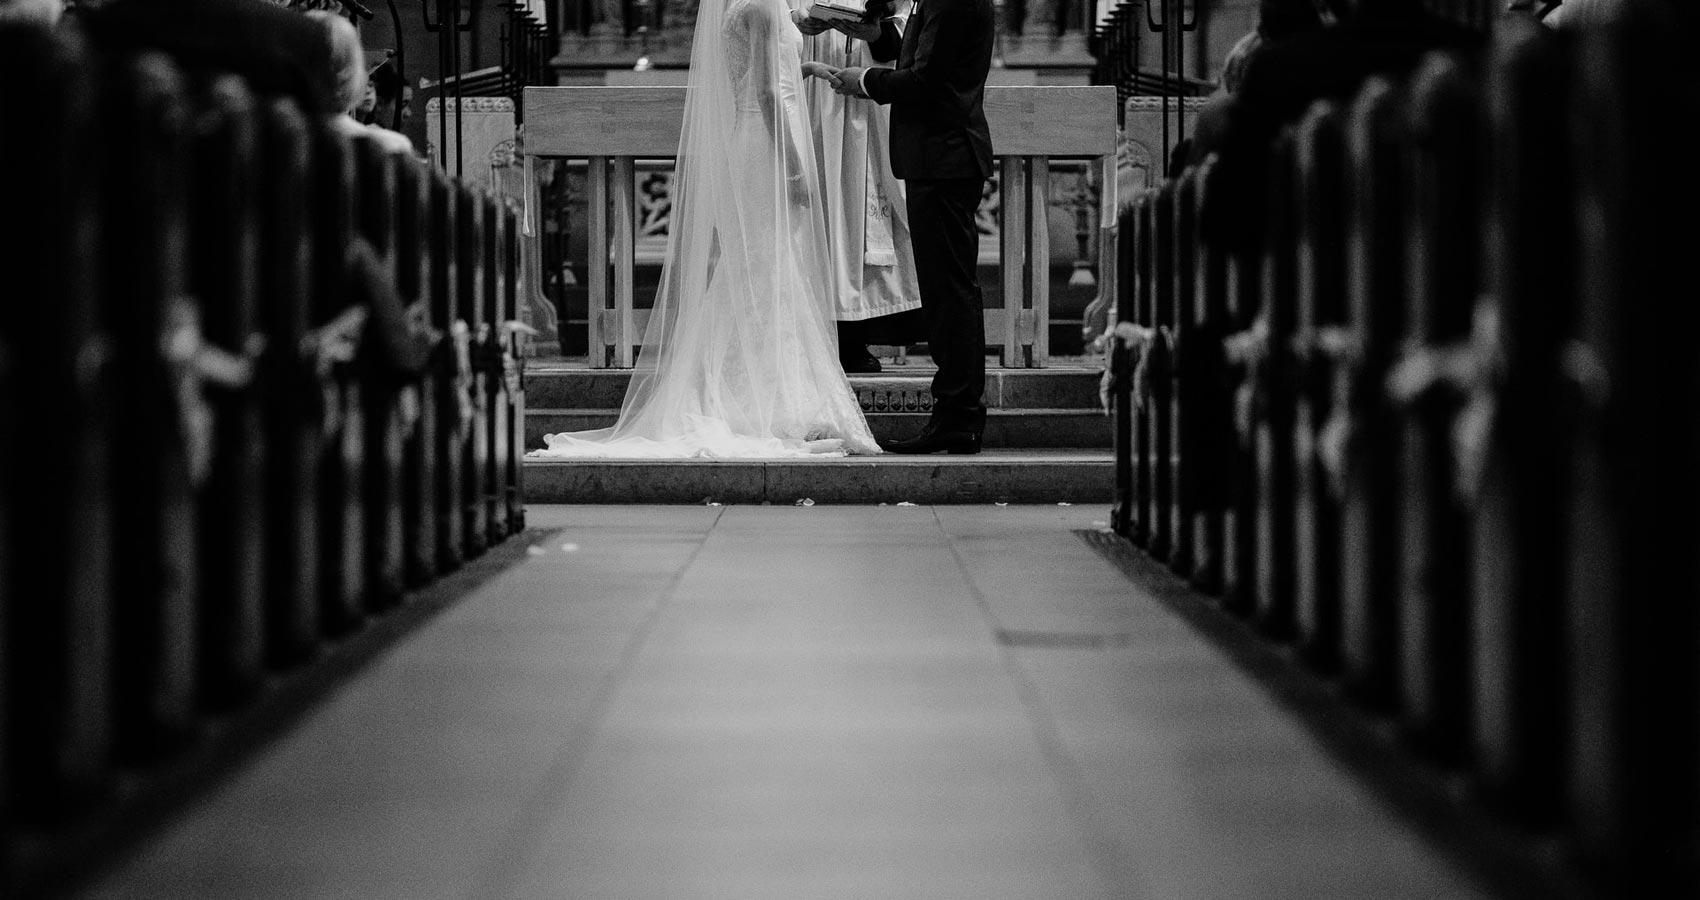 Wedding Daze, flash fiction by Joe Cushnan at Spillwords.com